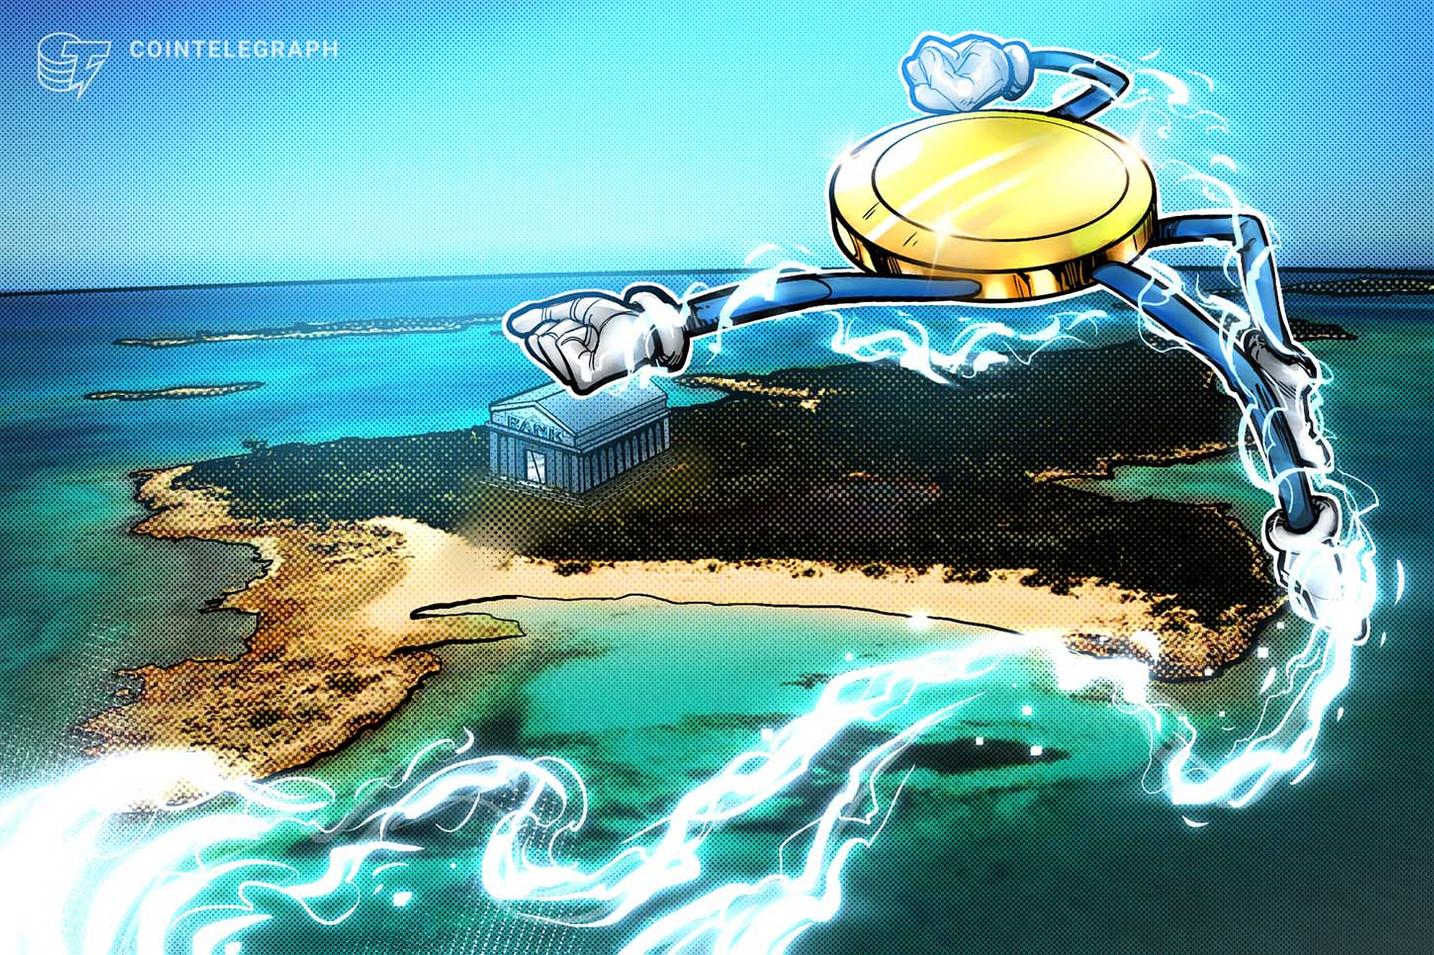 Bahamas: Sand Dollar bald vollständig integriert